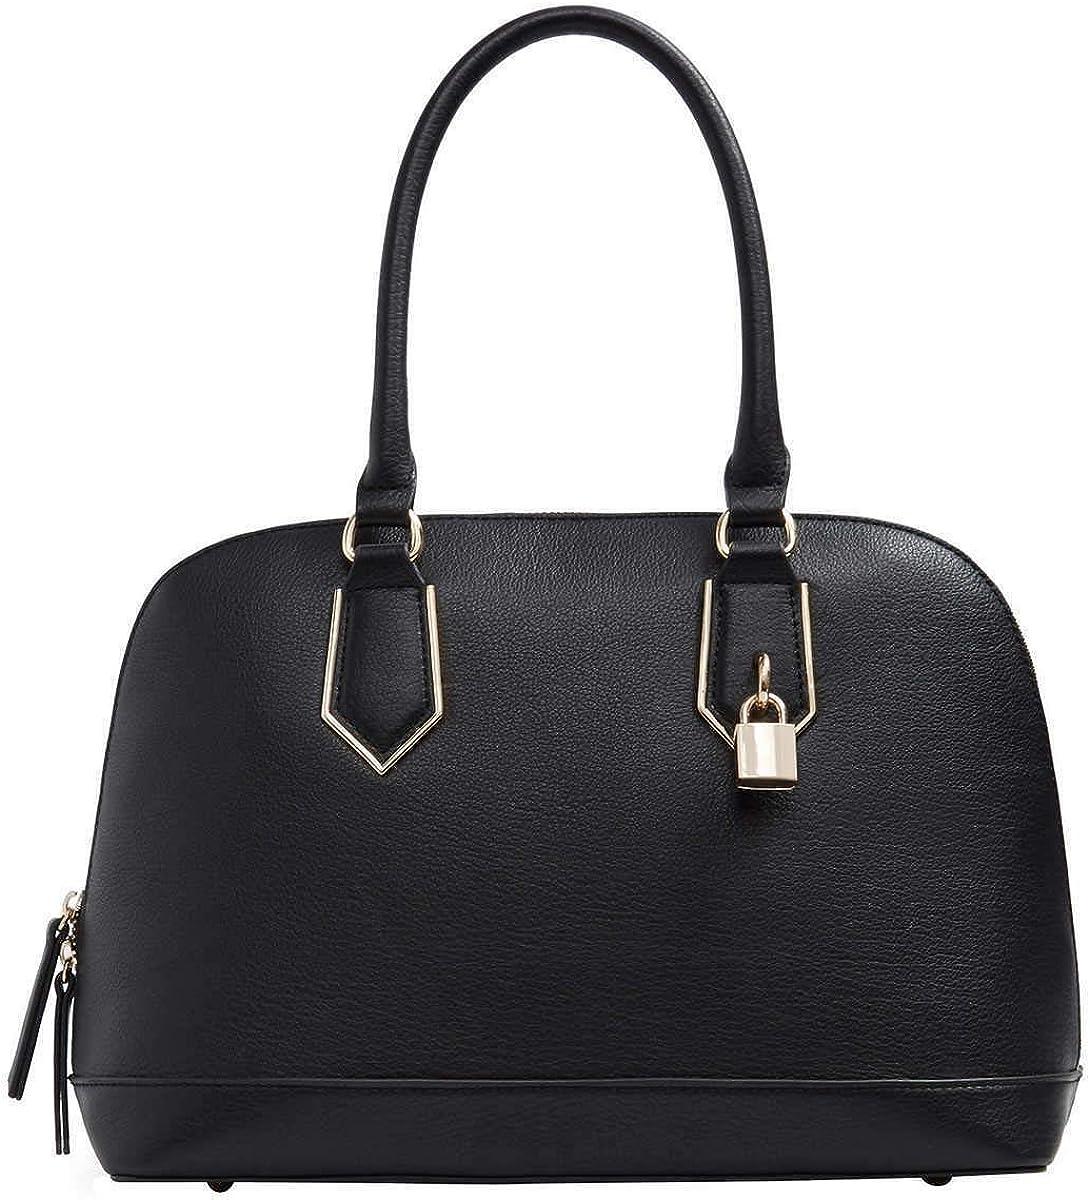 Hilary Radley Classic Bargain sale Faye Satchel purse womens hand bag